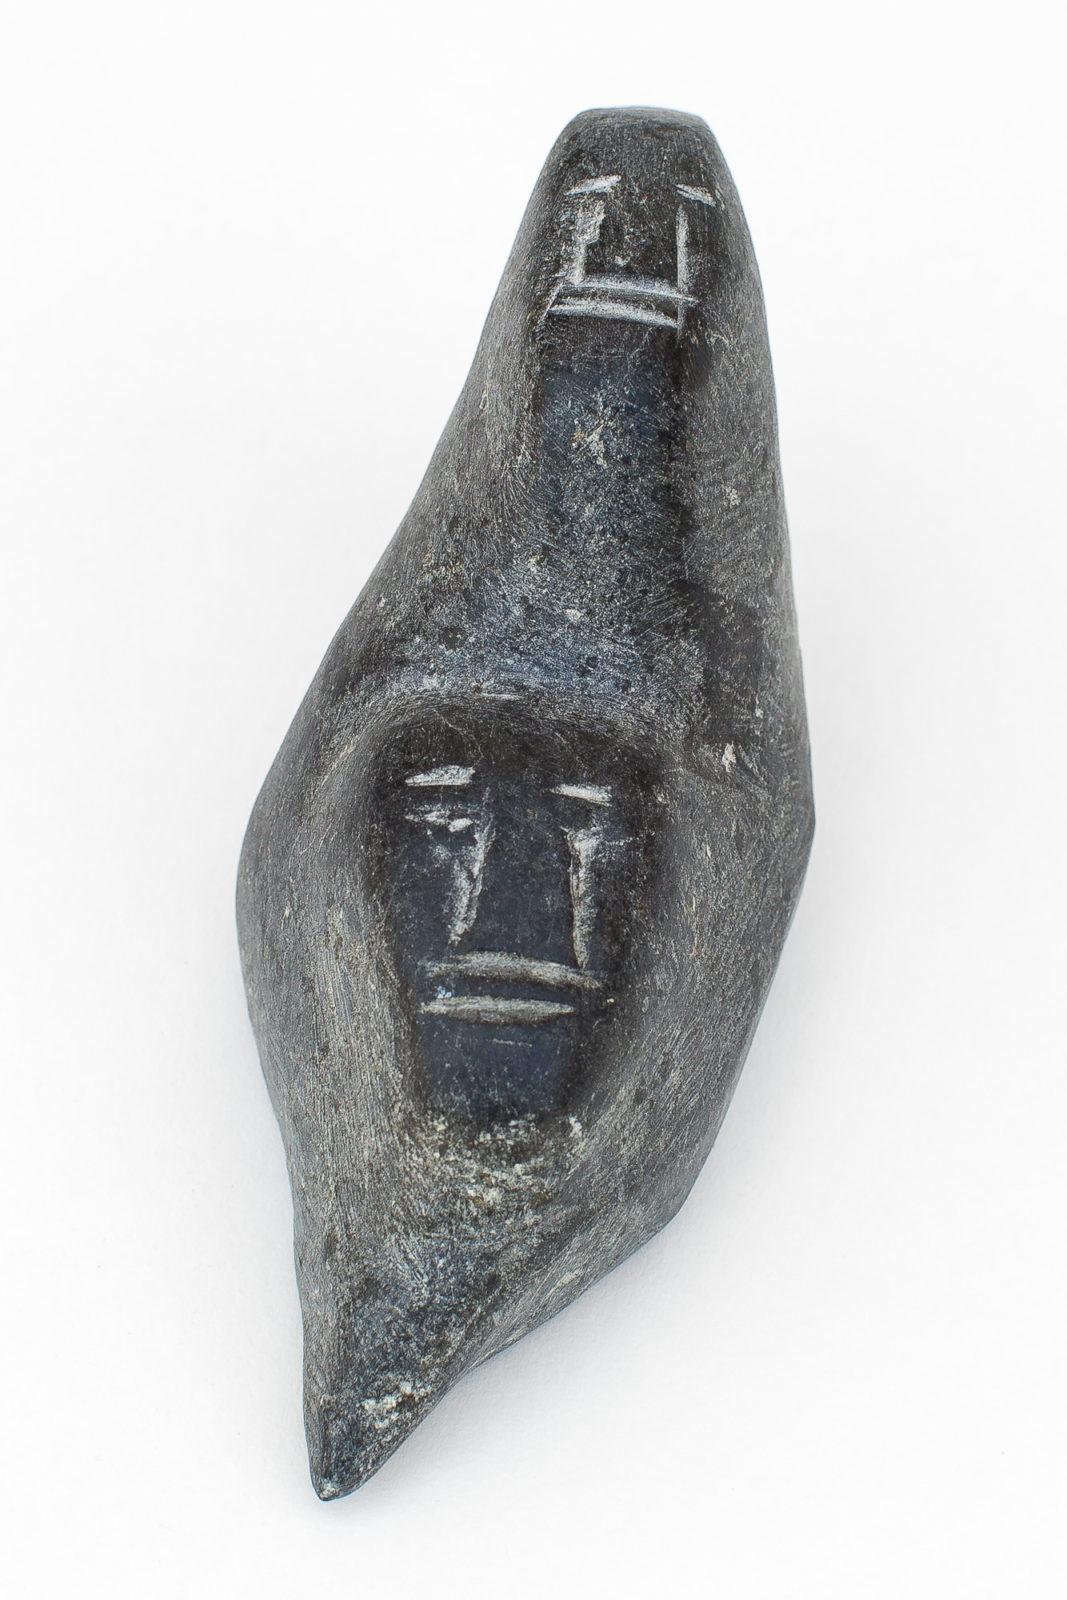 Theresa Akadlaka - untitled (two heads)